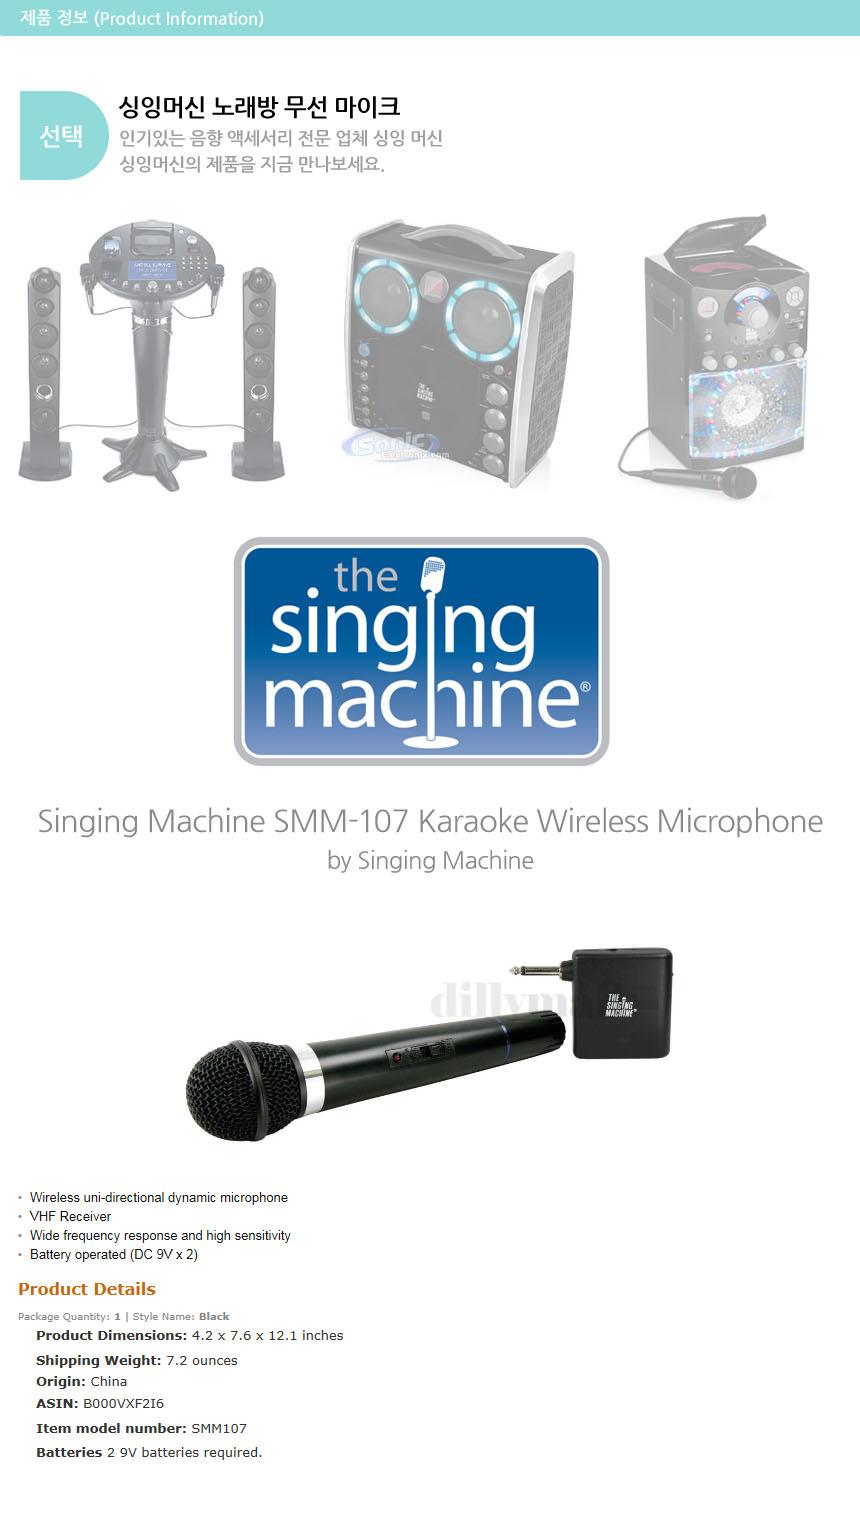 singing machine smm 107 karaoke wireless microphone